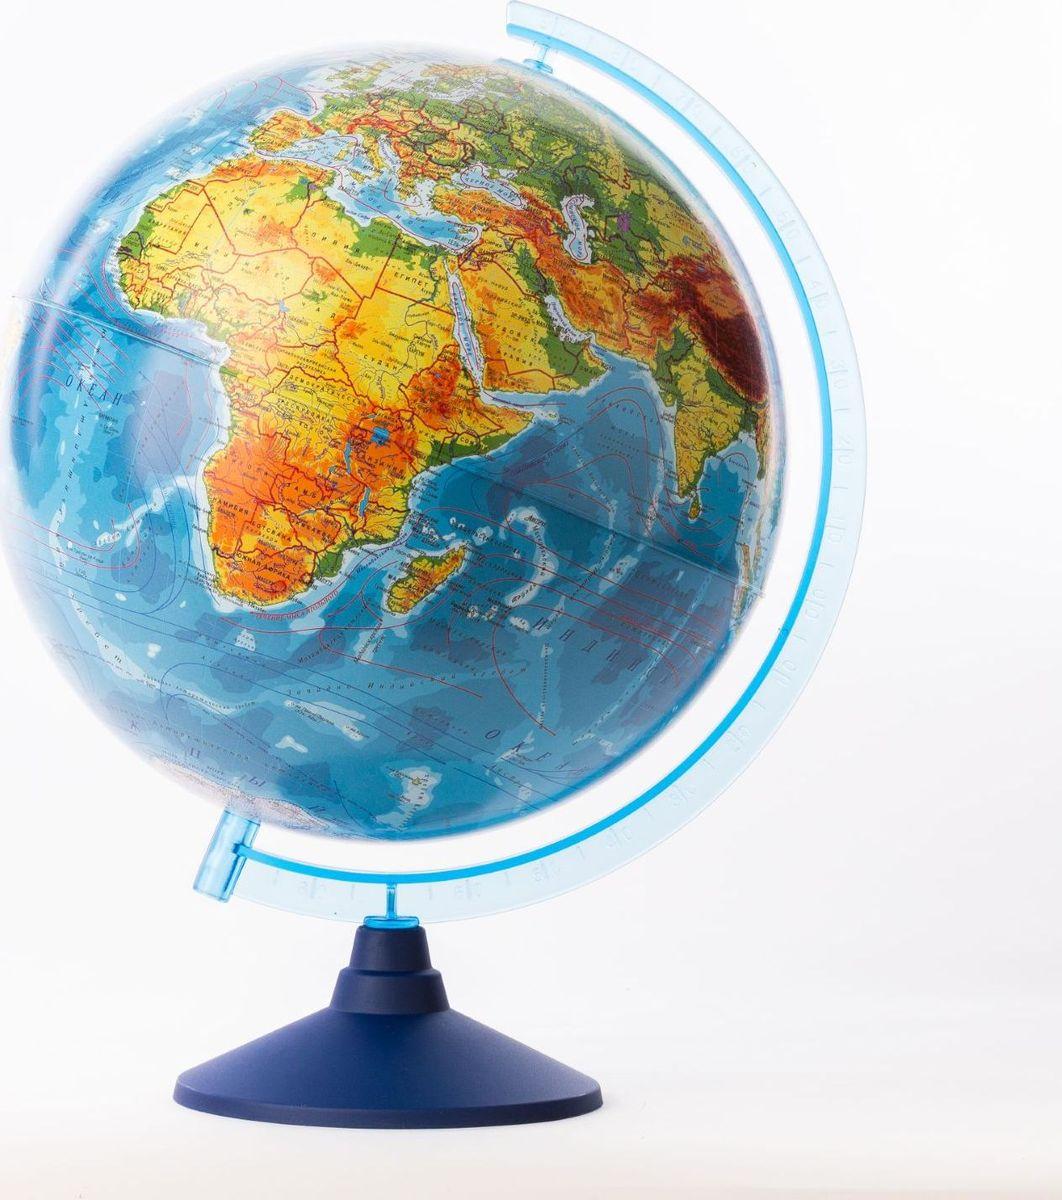 Глобен Глобус физический Классик Евро диаметр 32 см